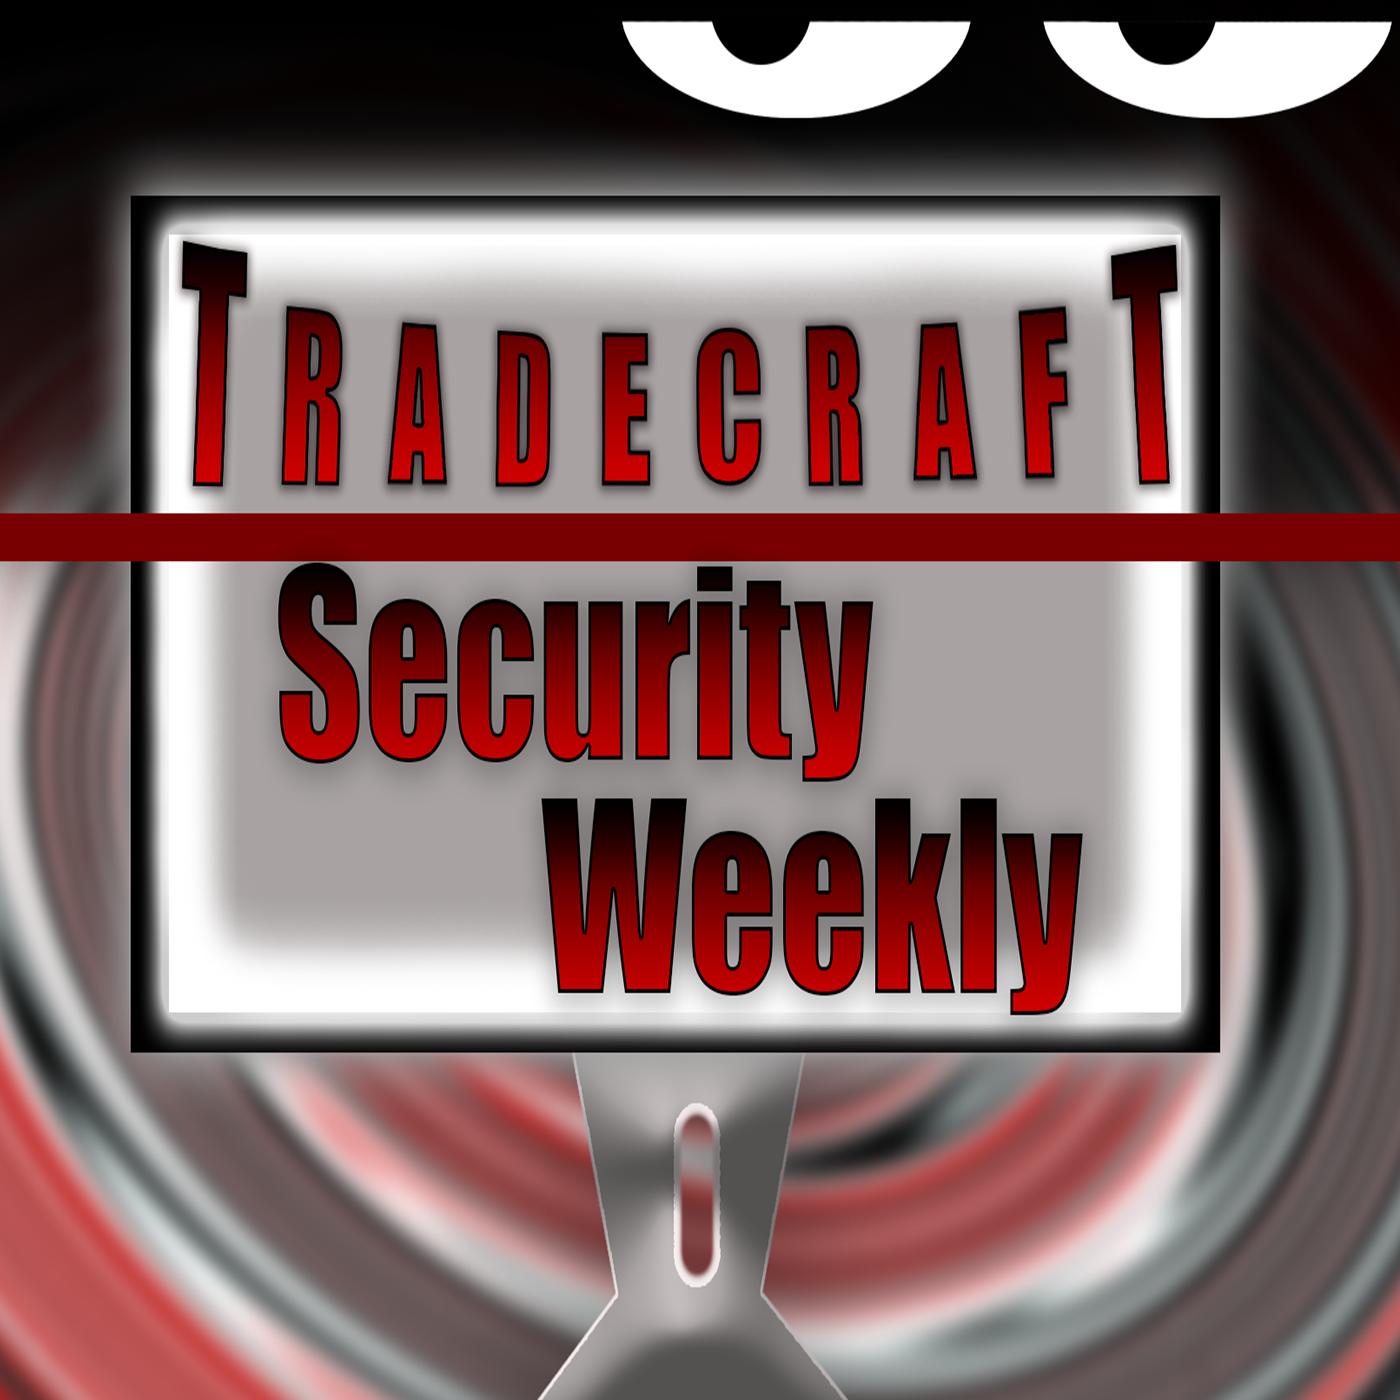 Tradecraft Security Weekly (Audio) show art